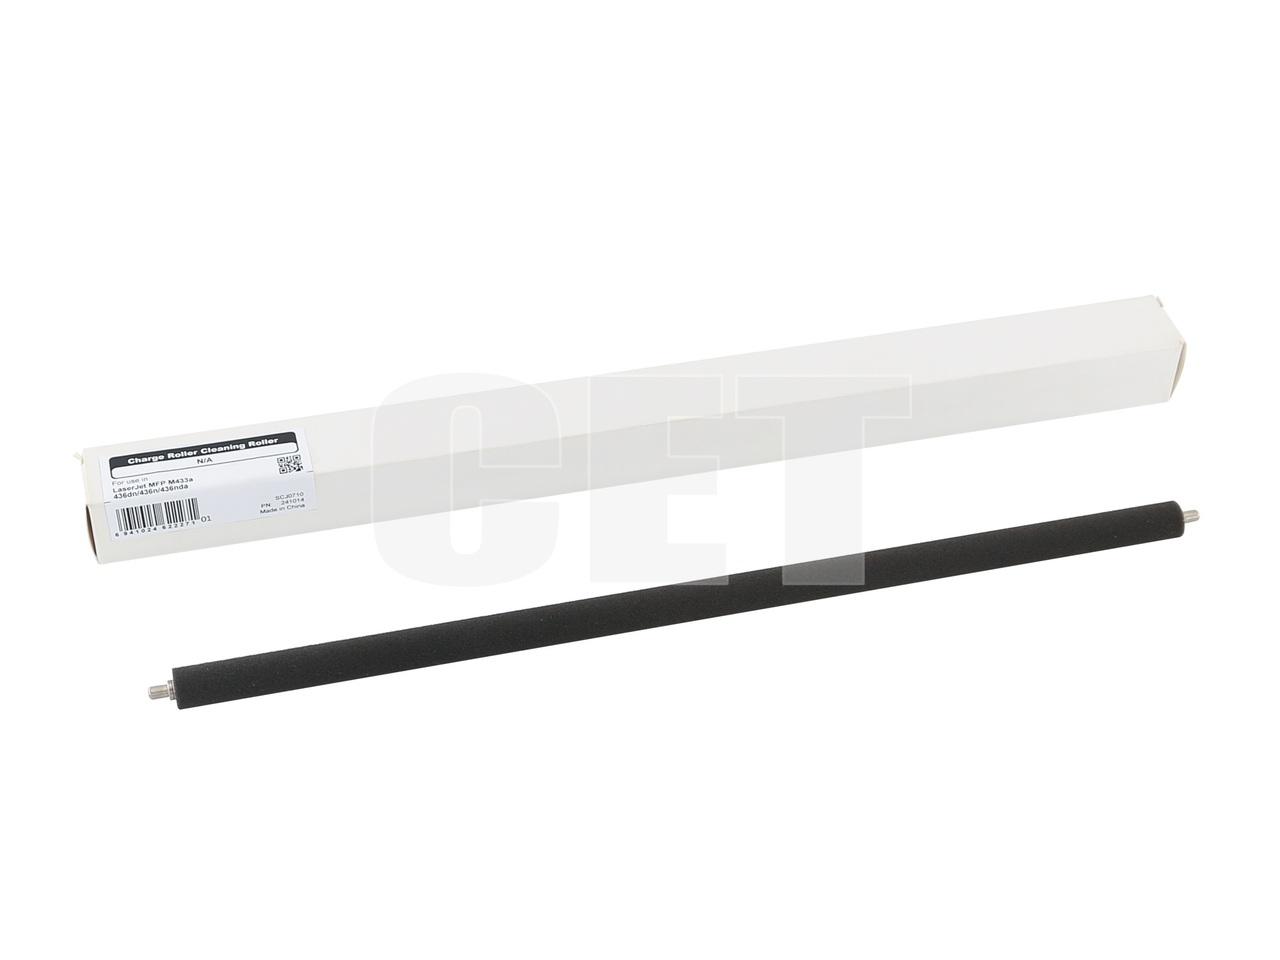 Ролик очистки ролика заряда для HP LaserJet MFPM433a/436dn/436n/436nda (CET), CET241014